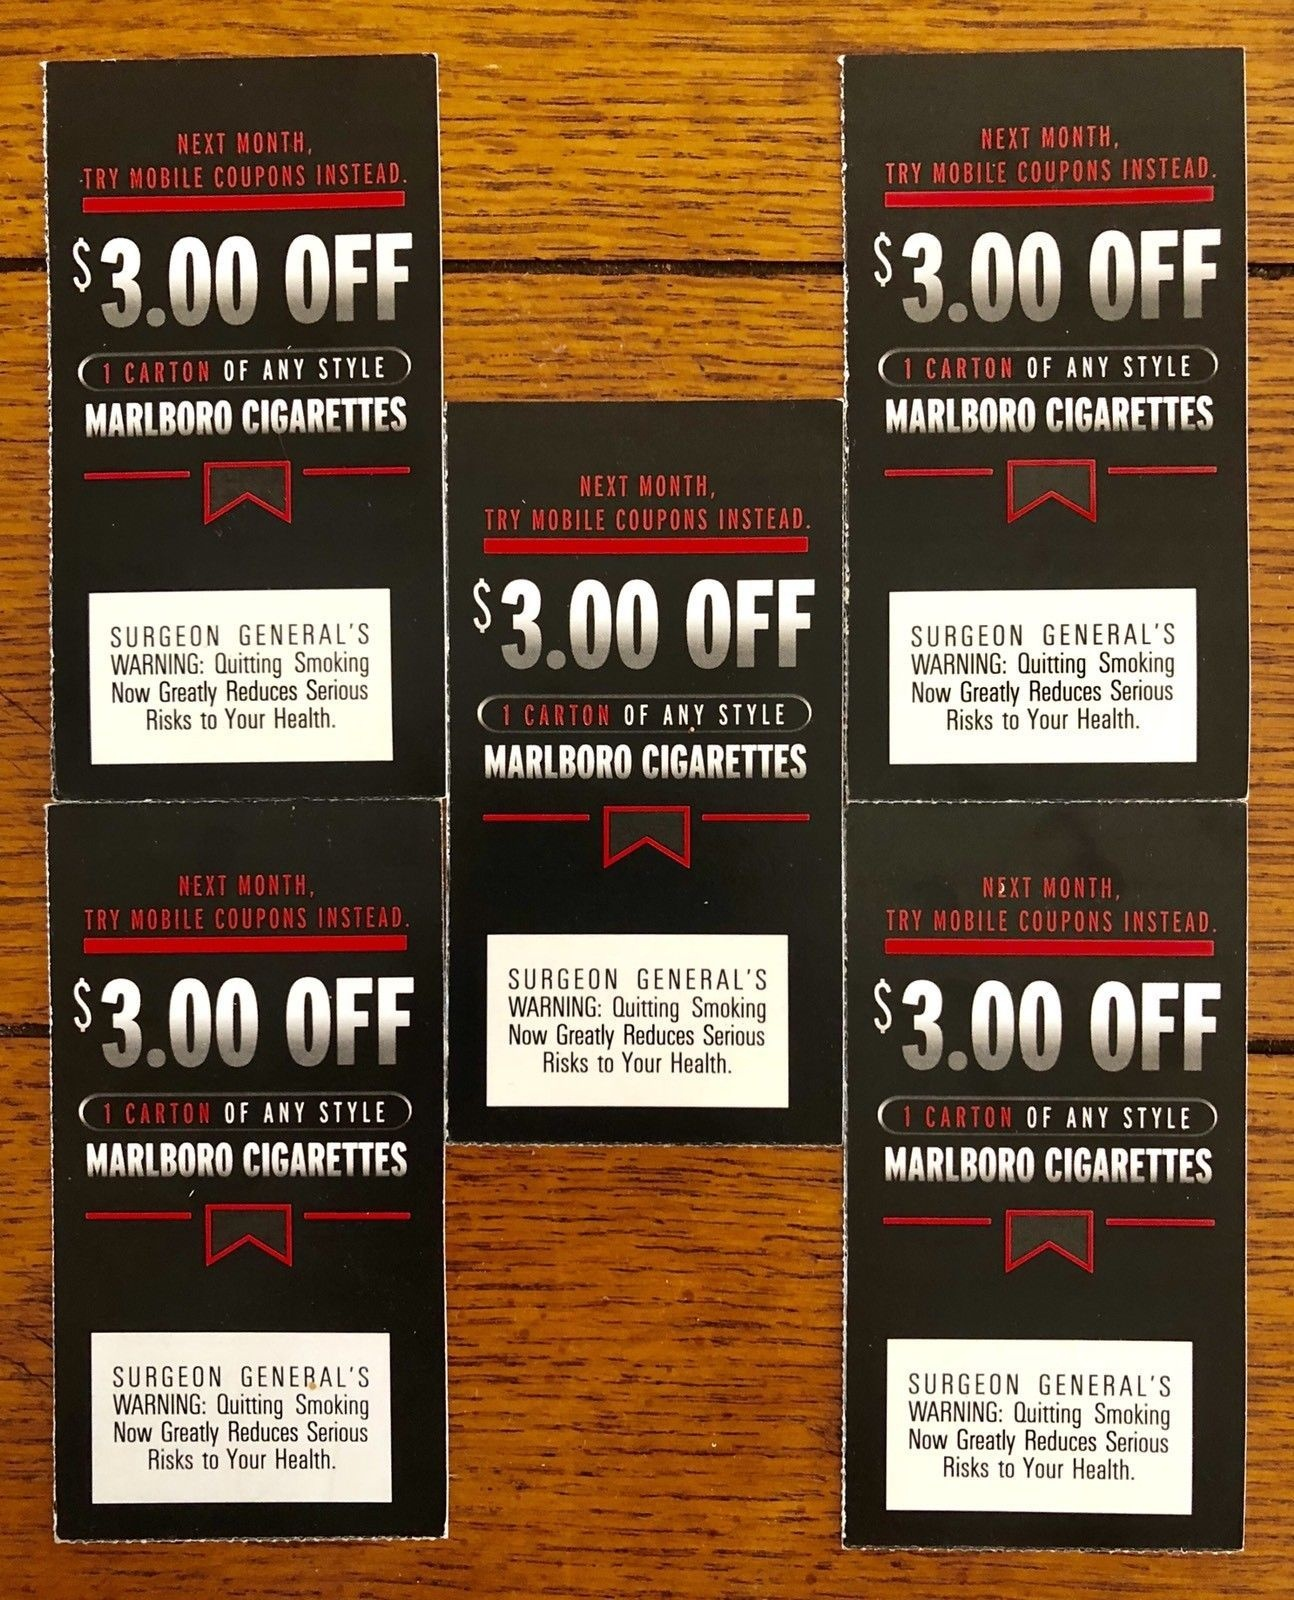 Free Printable Newport Cigarette Coupons